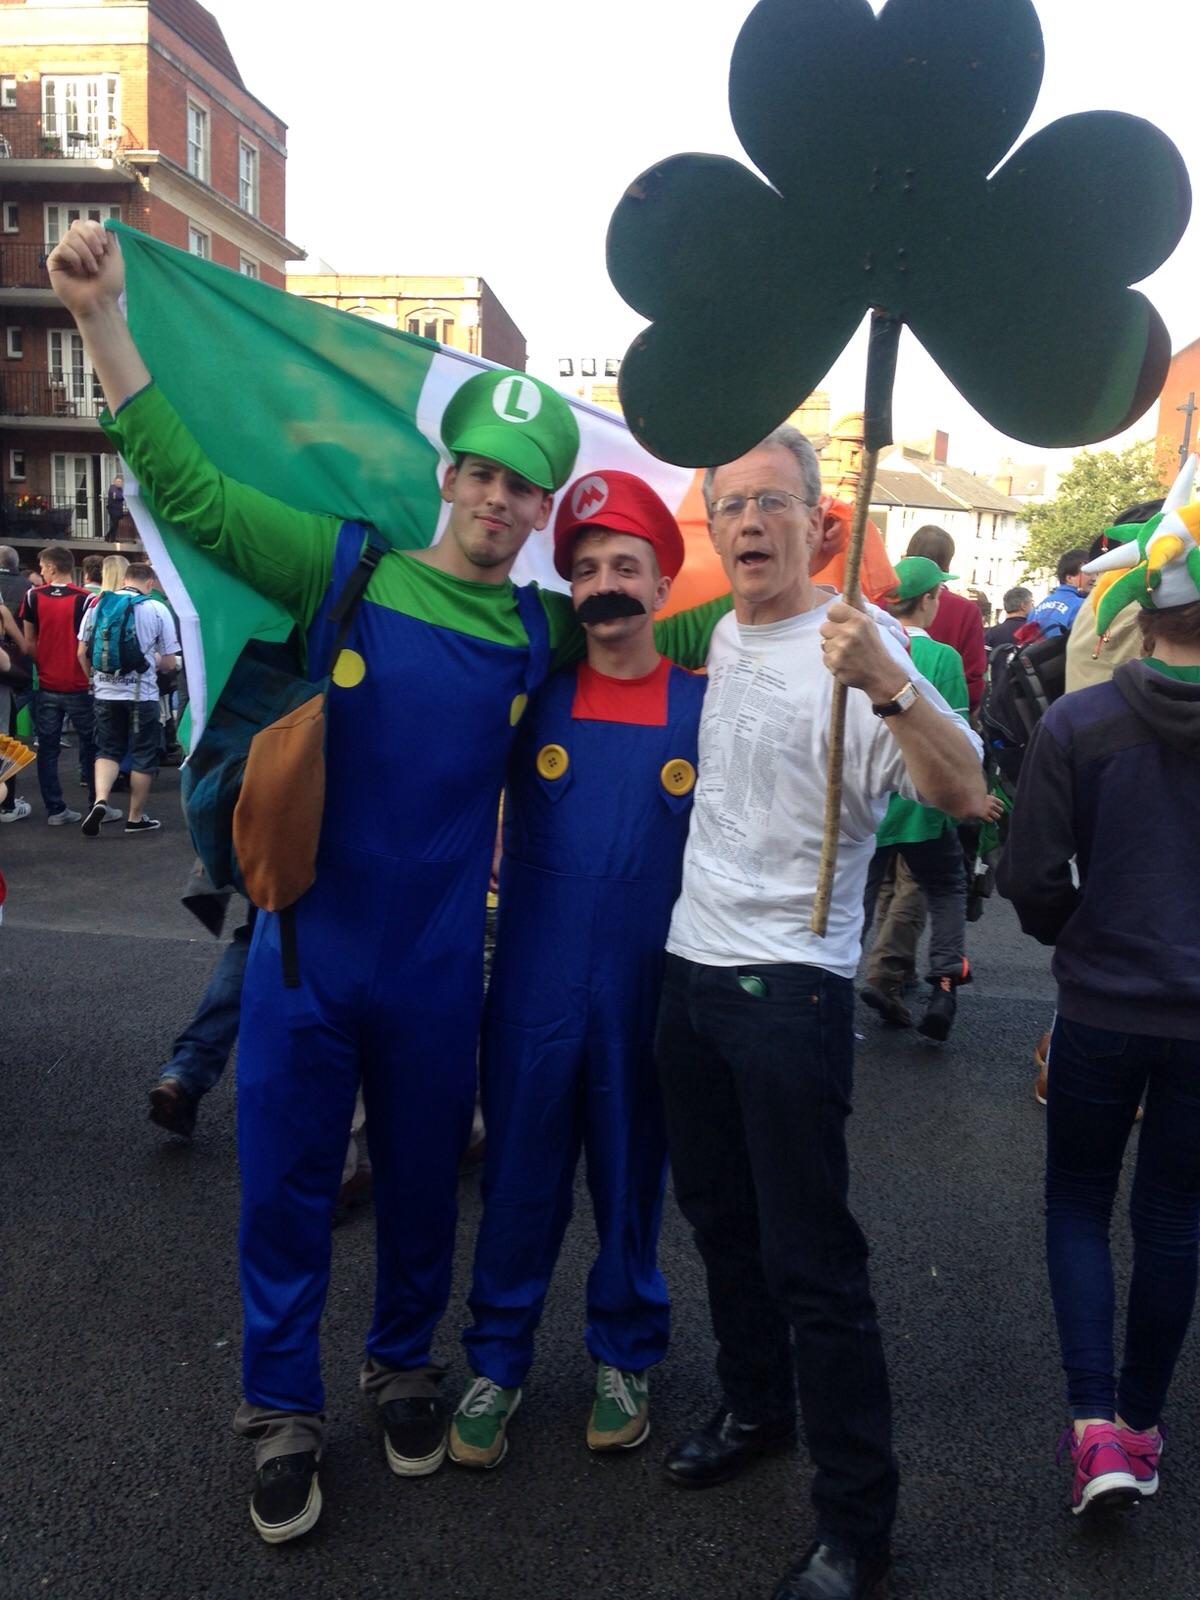 Super Mario Brothers embrace the shamrock